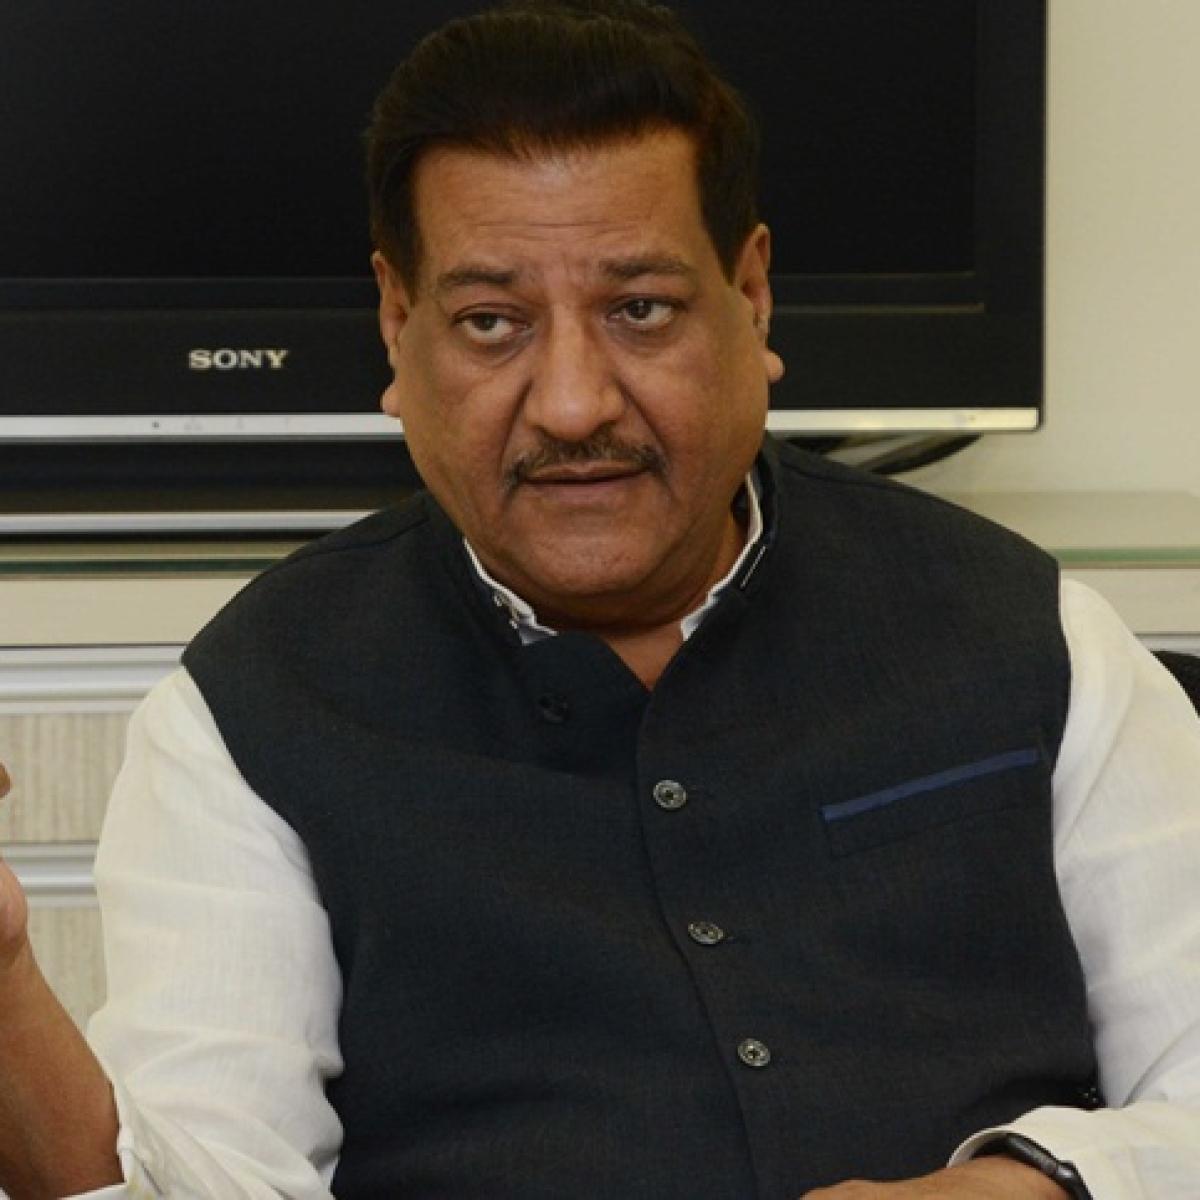 New COVID-19 strain: Former Maharashtra CM Prithviraj Chavan bats for 'immediate suspension' of UK flights